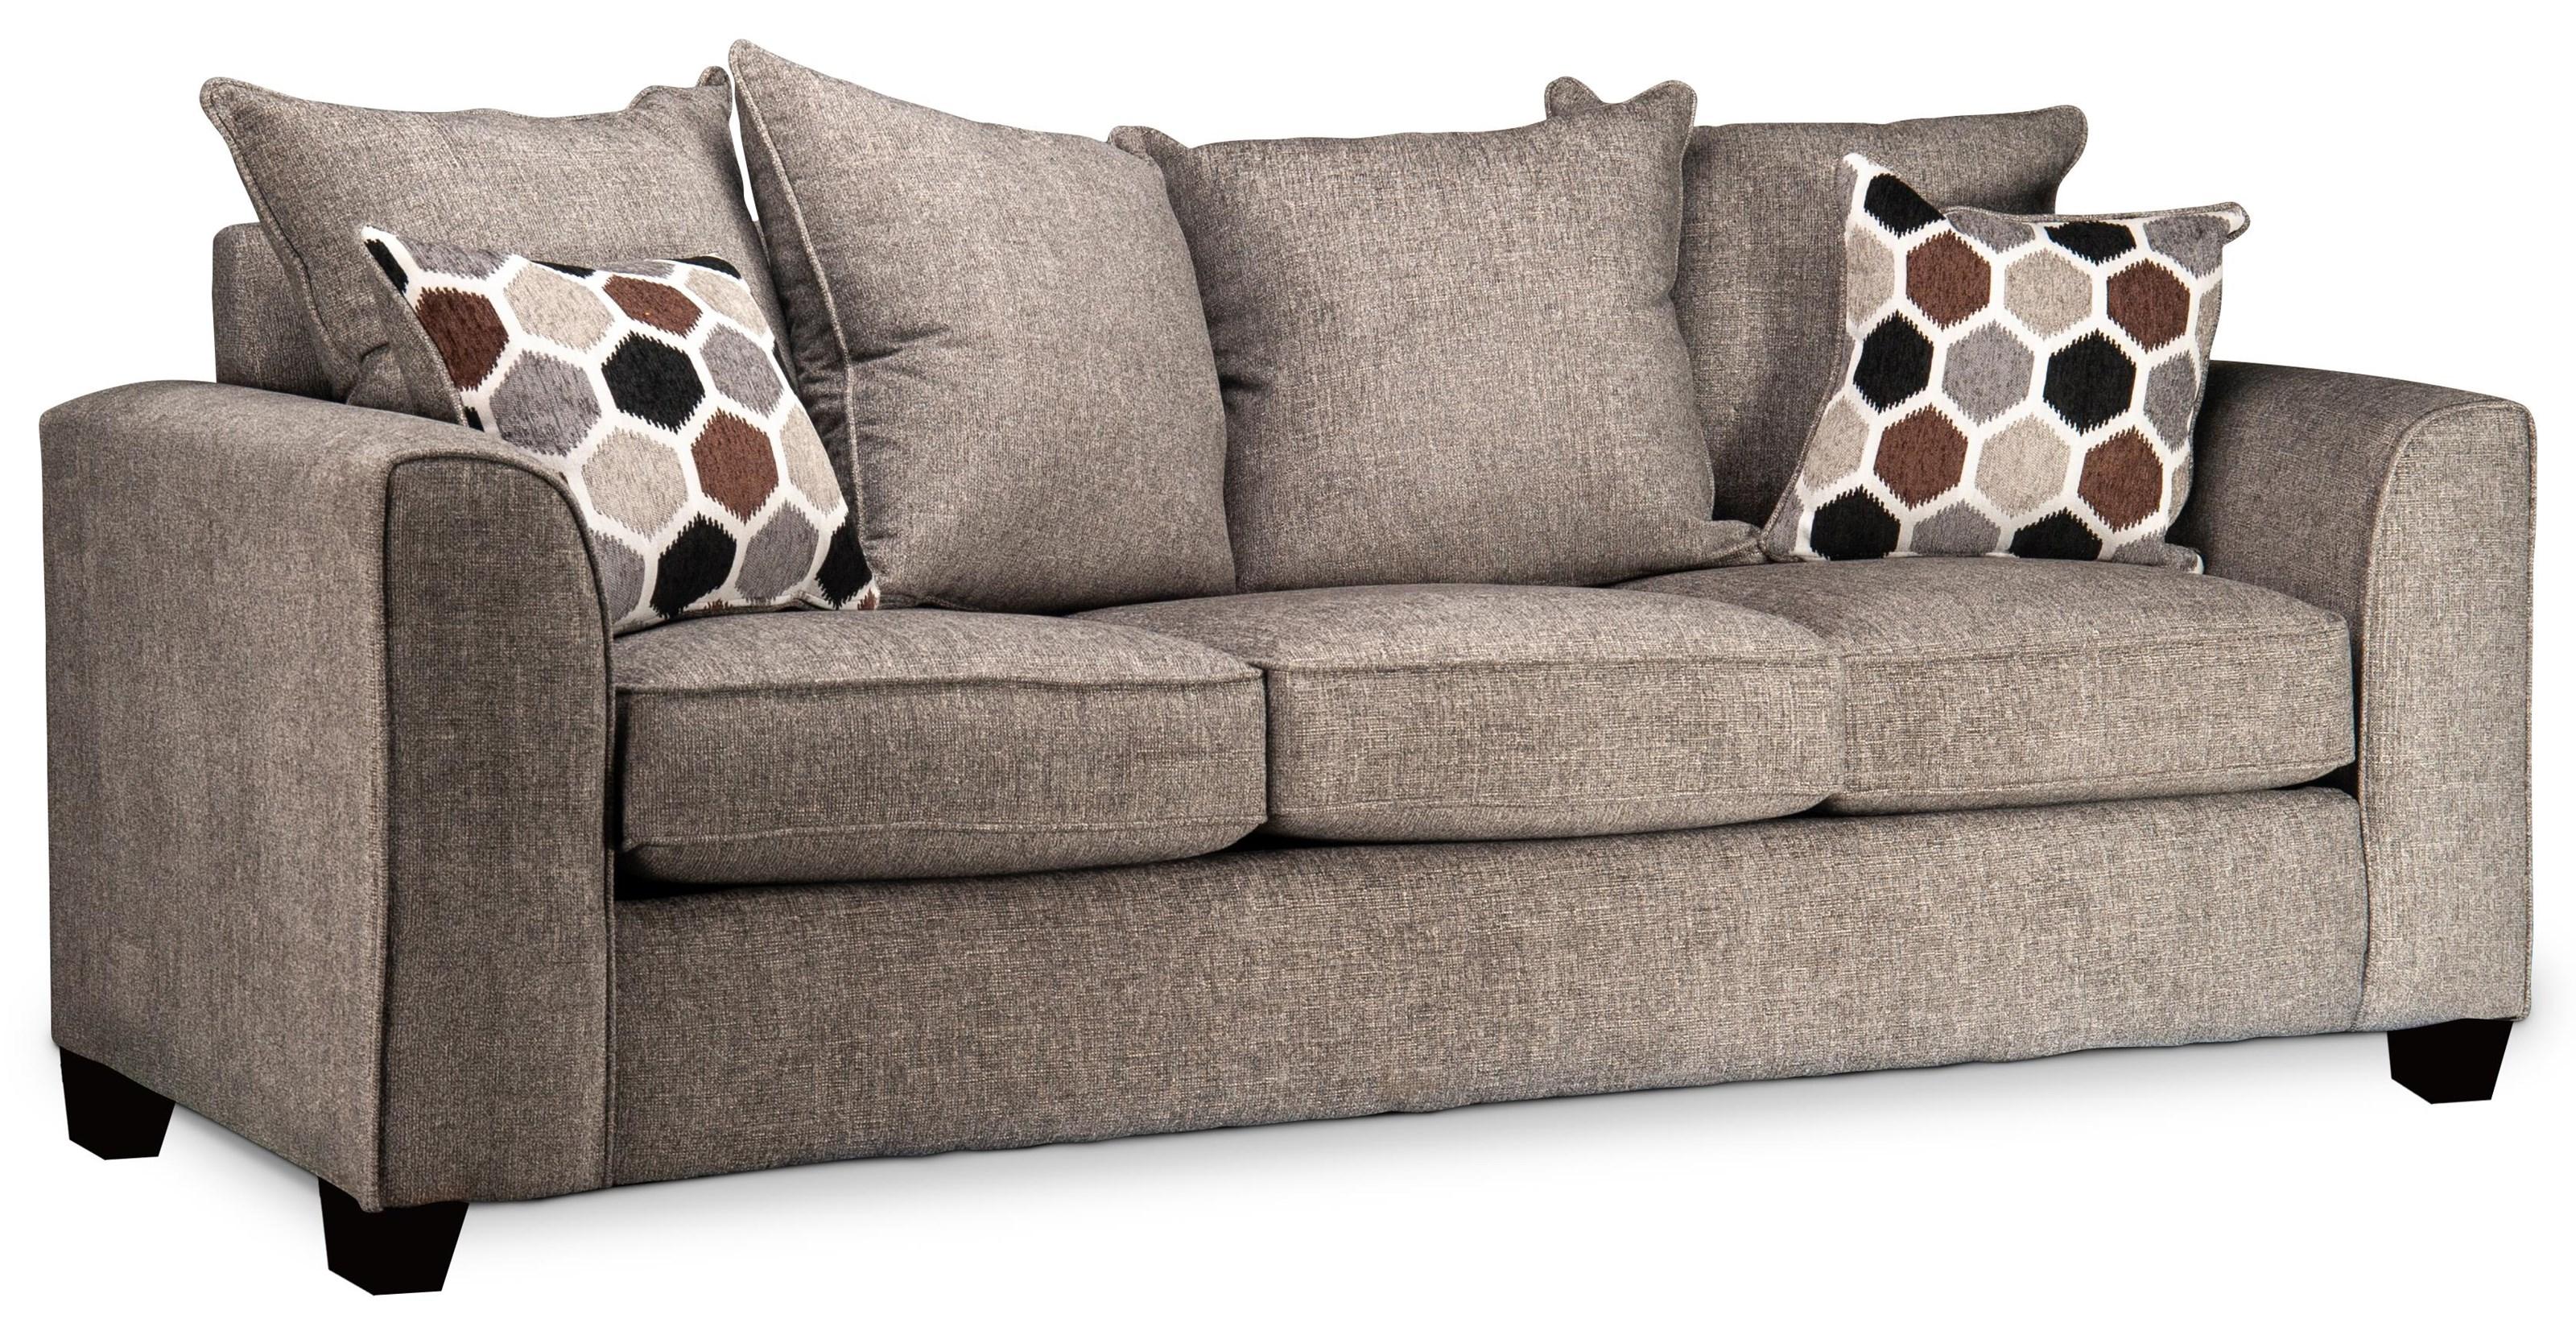 Tripp Tripp Sofa by Peak Living at Morris Home